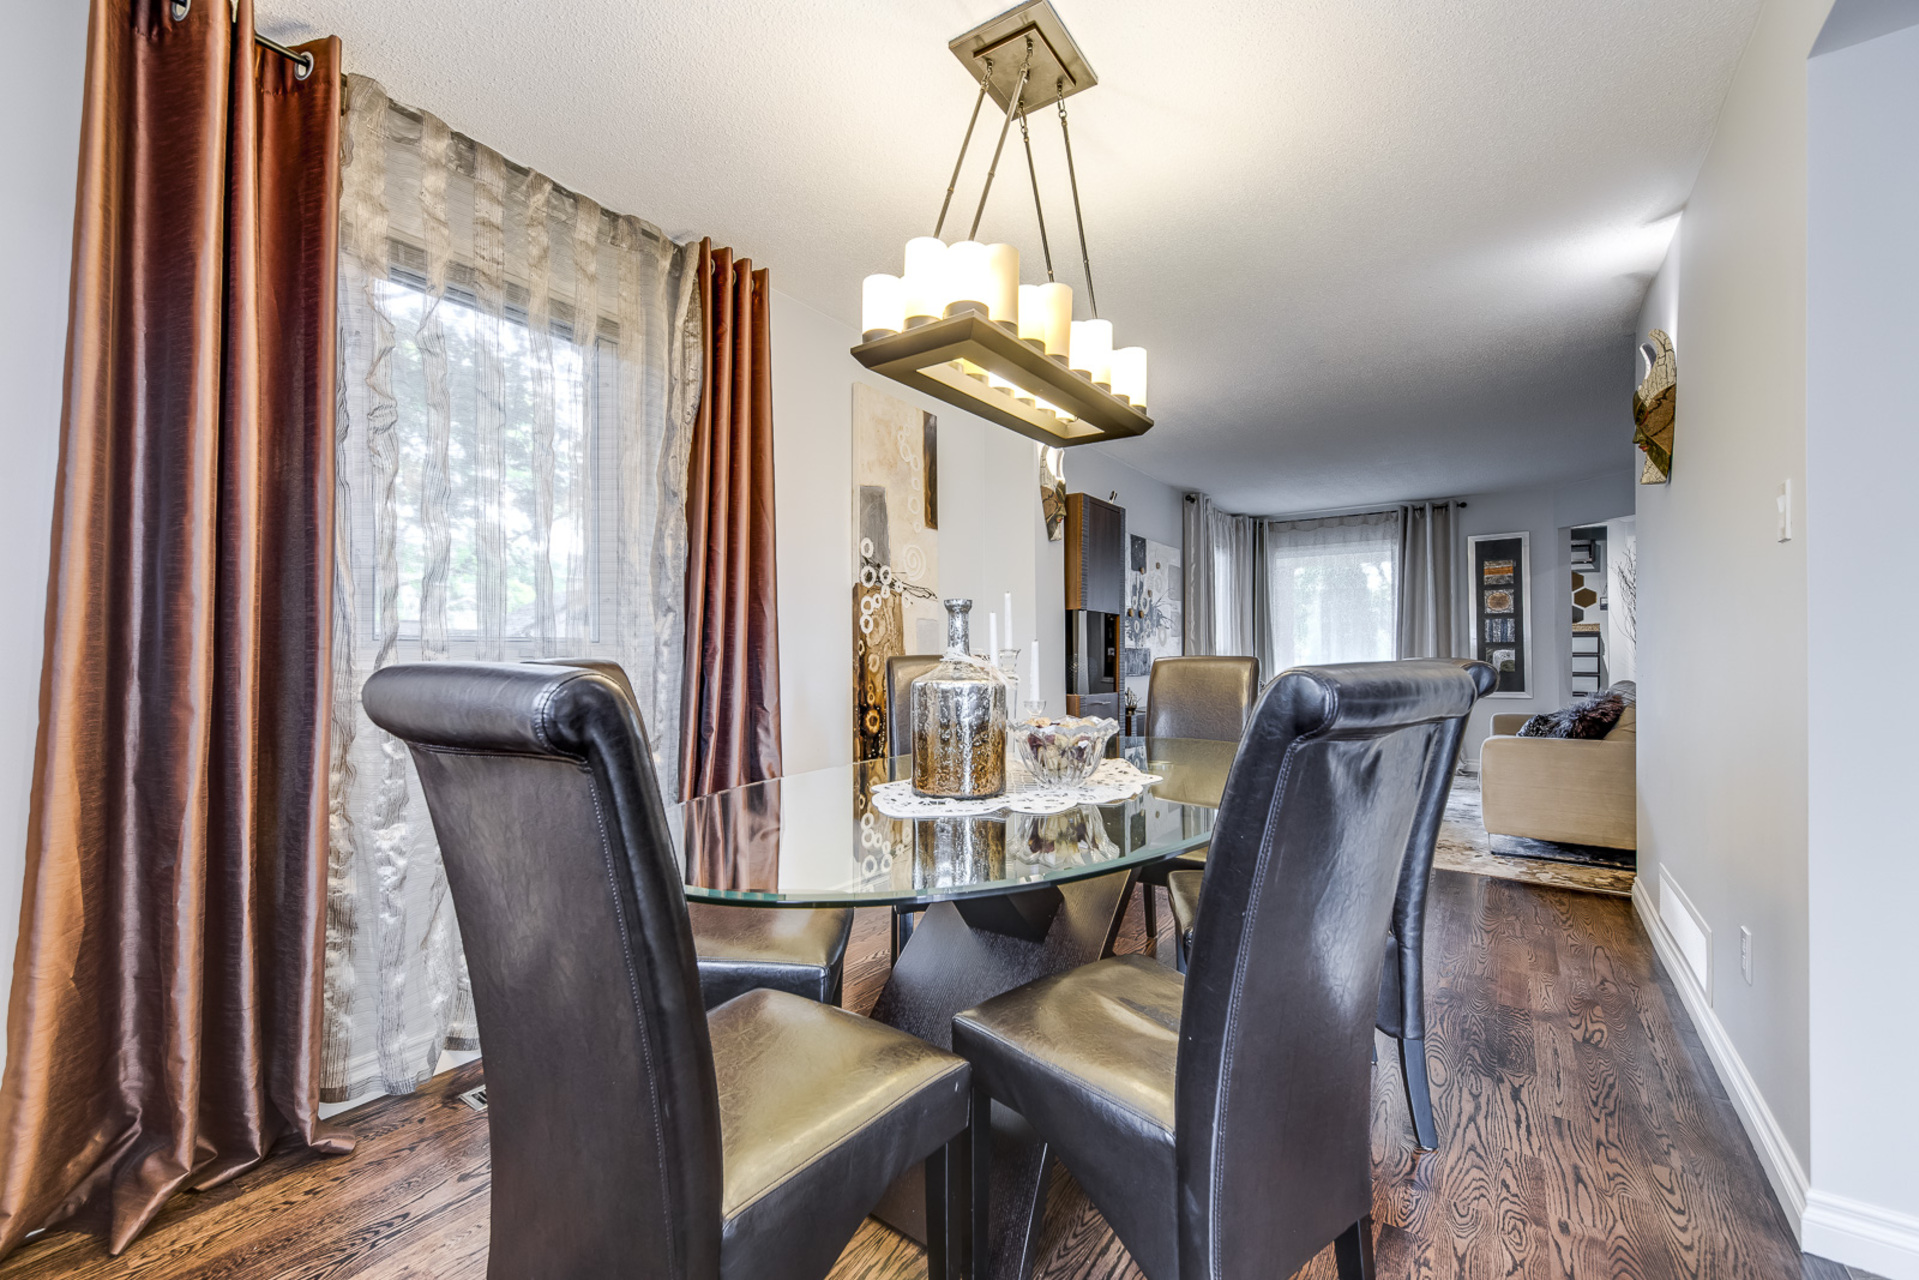 Dining Room - 1308 Valerie Cres, Oakville - Elite3 & Team at 1308 Valerie Crescent, Clearview, Oakville